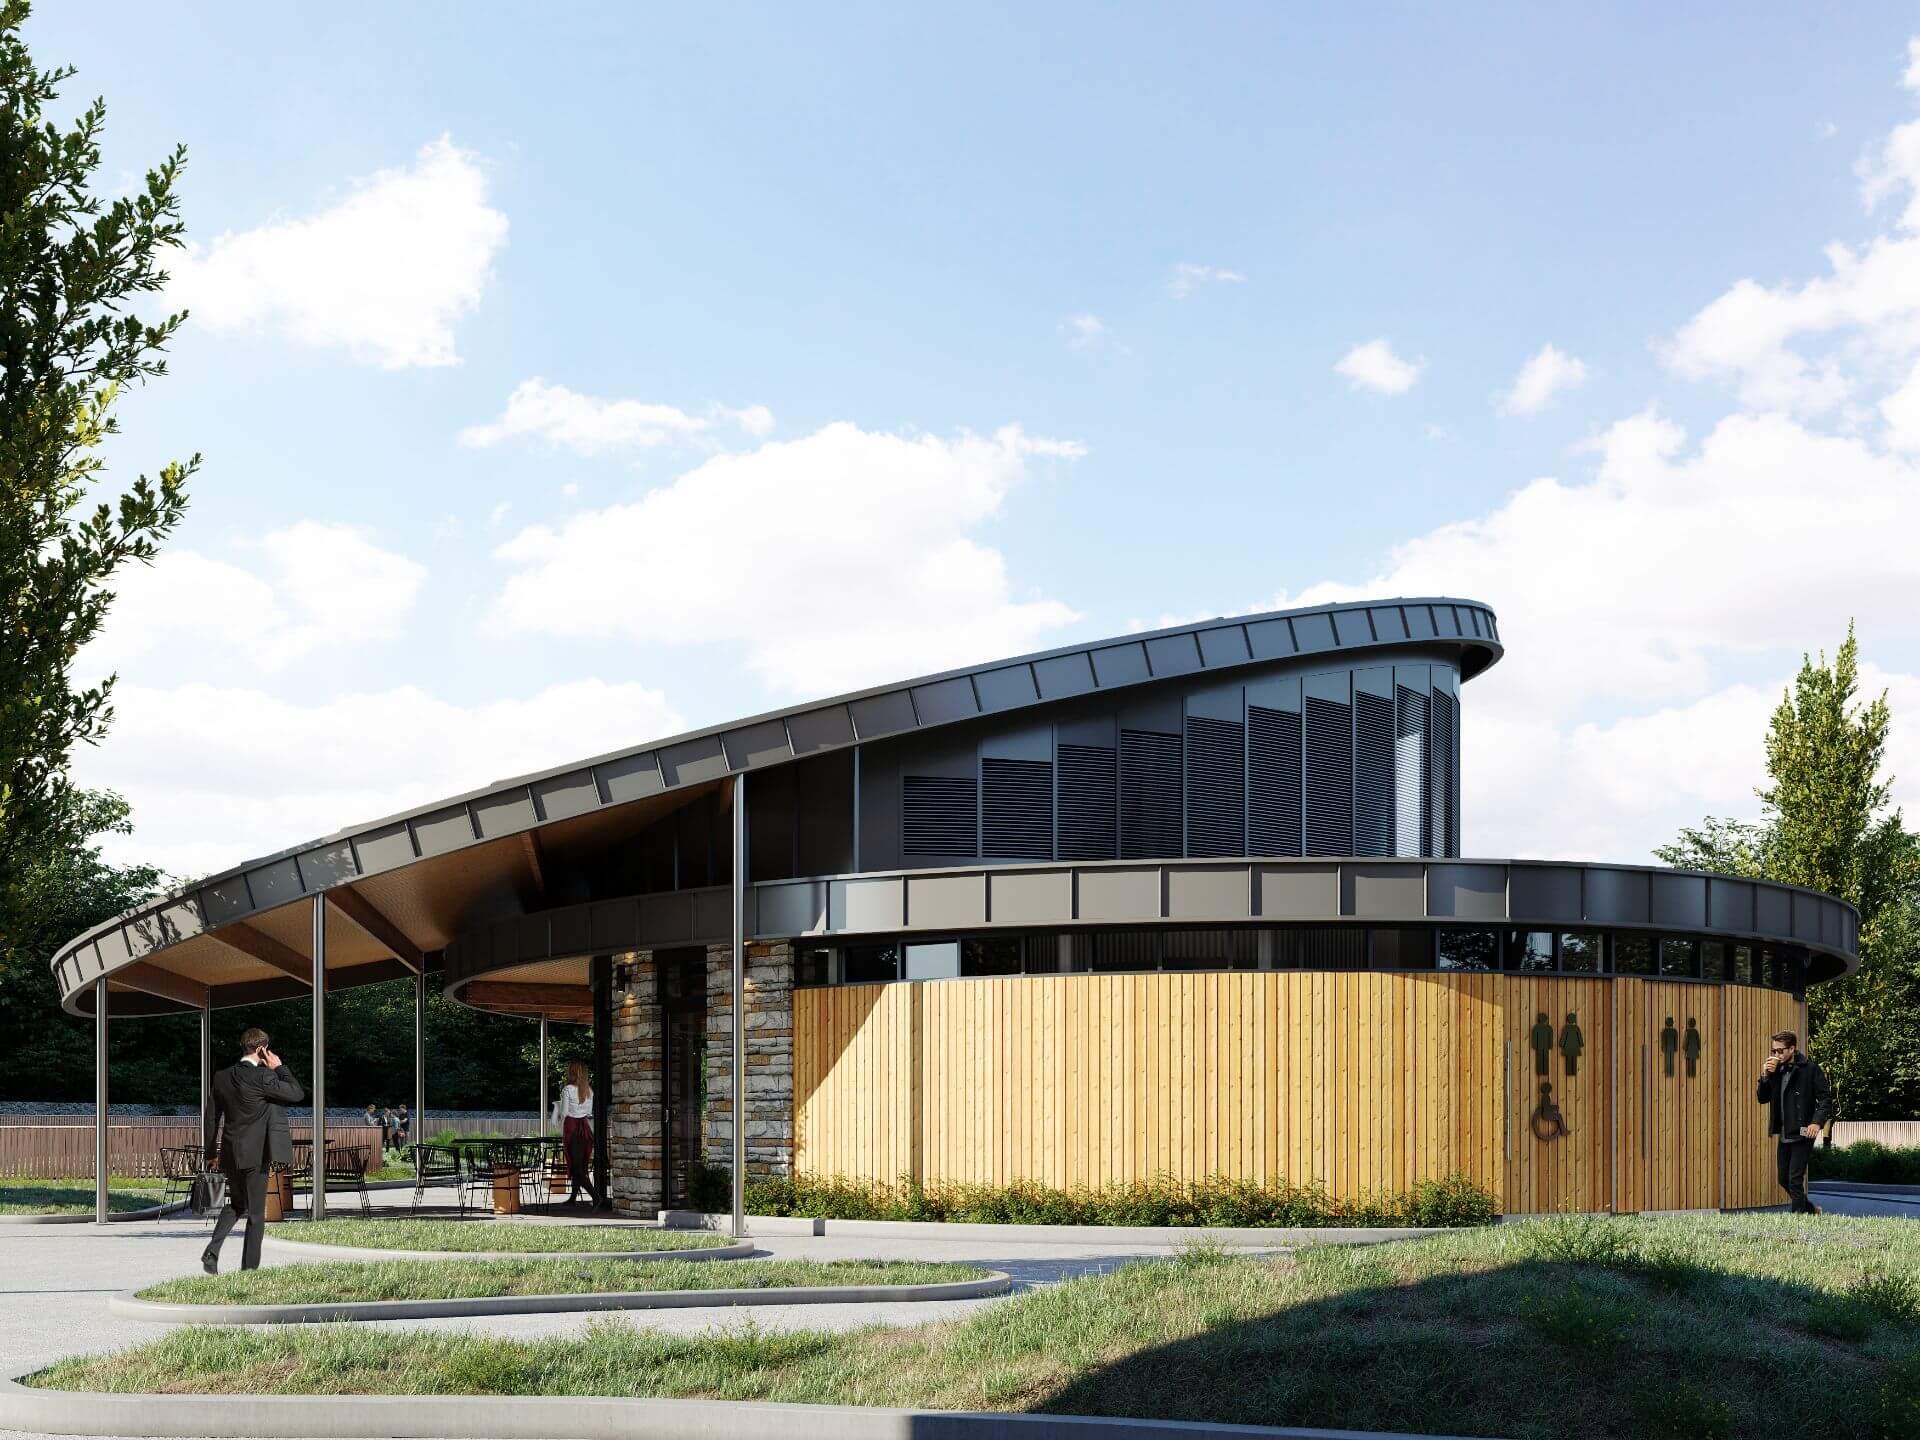 Exterior CGI of the Pavilion